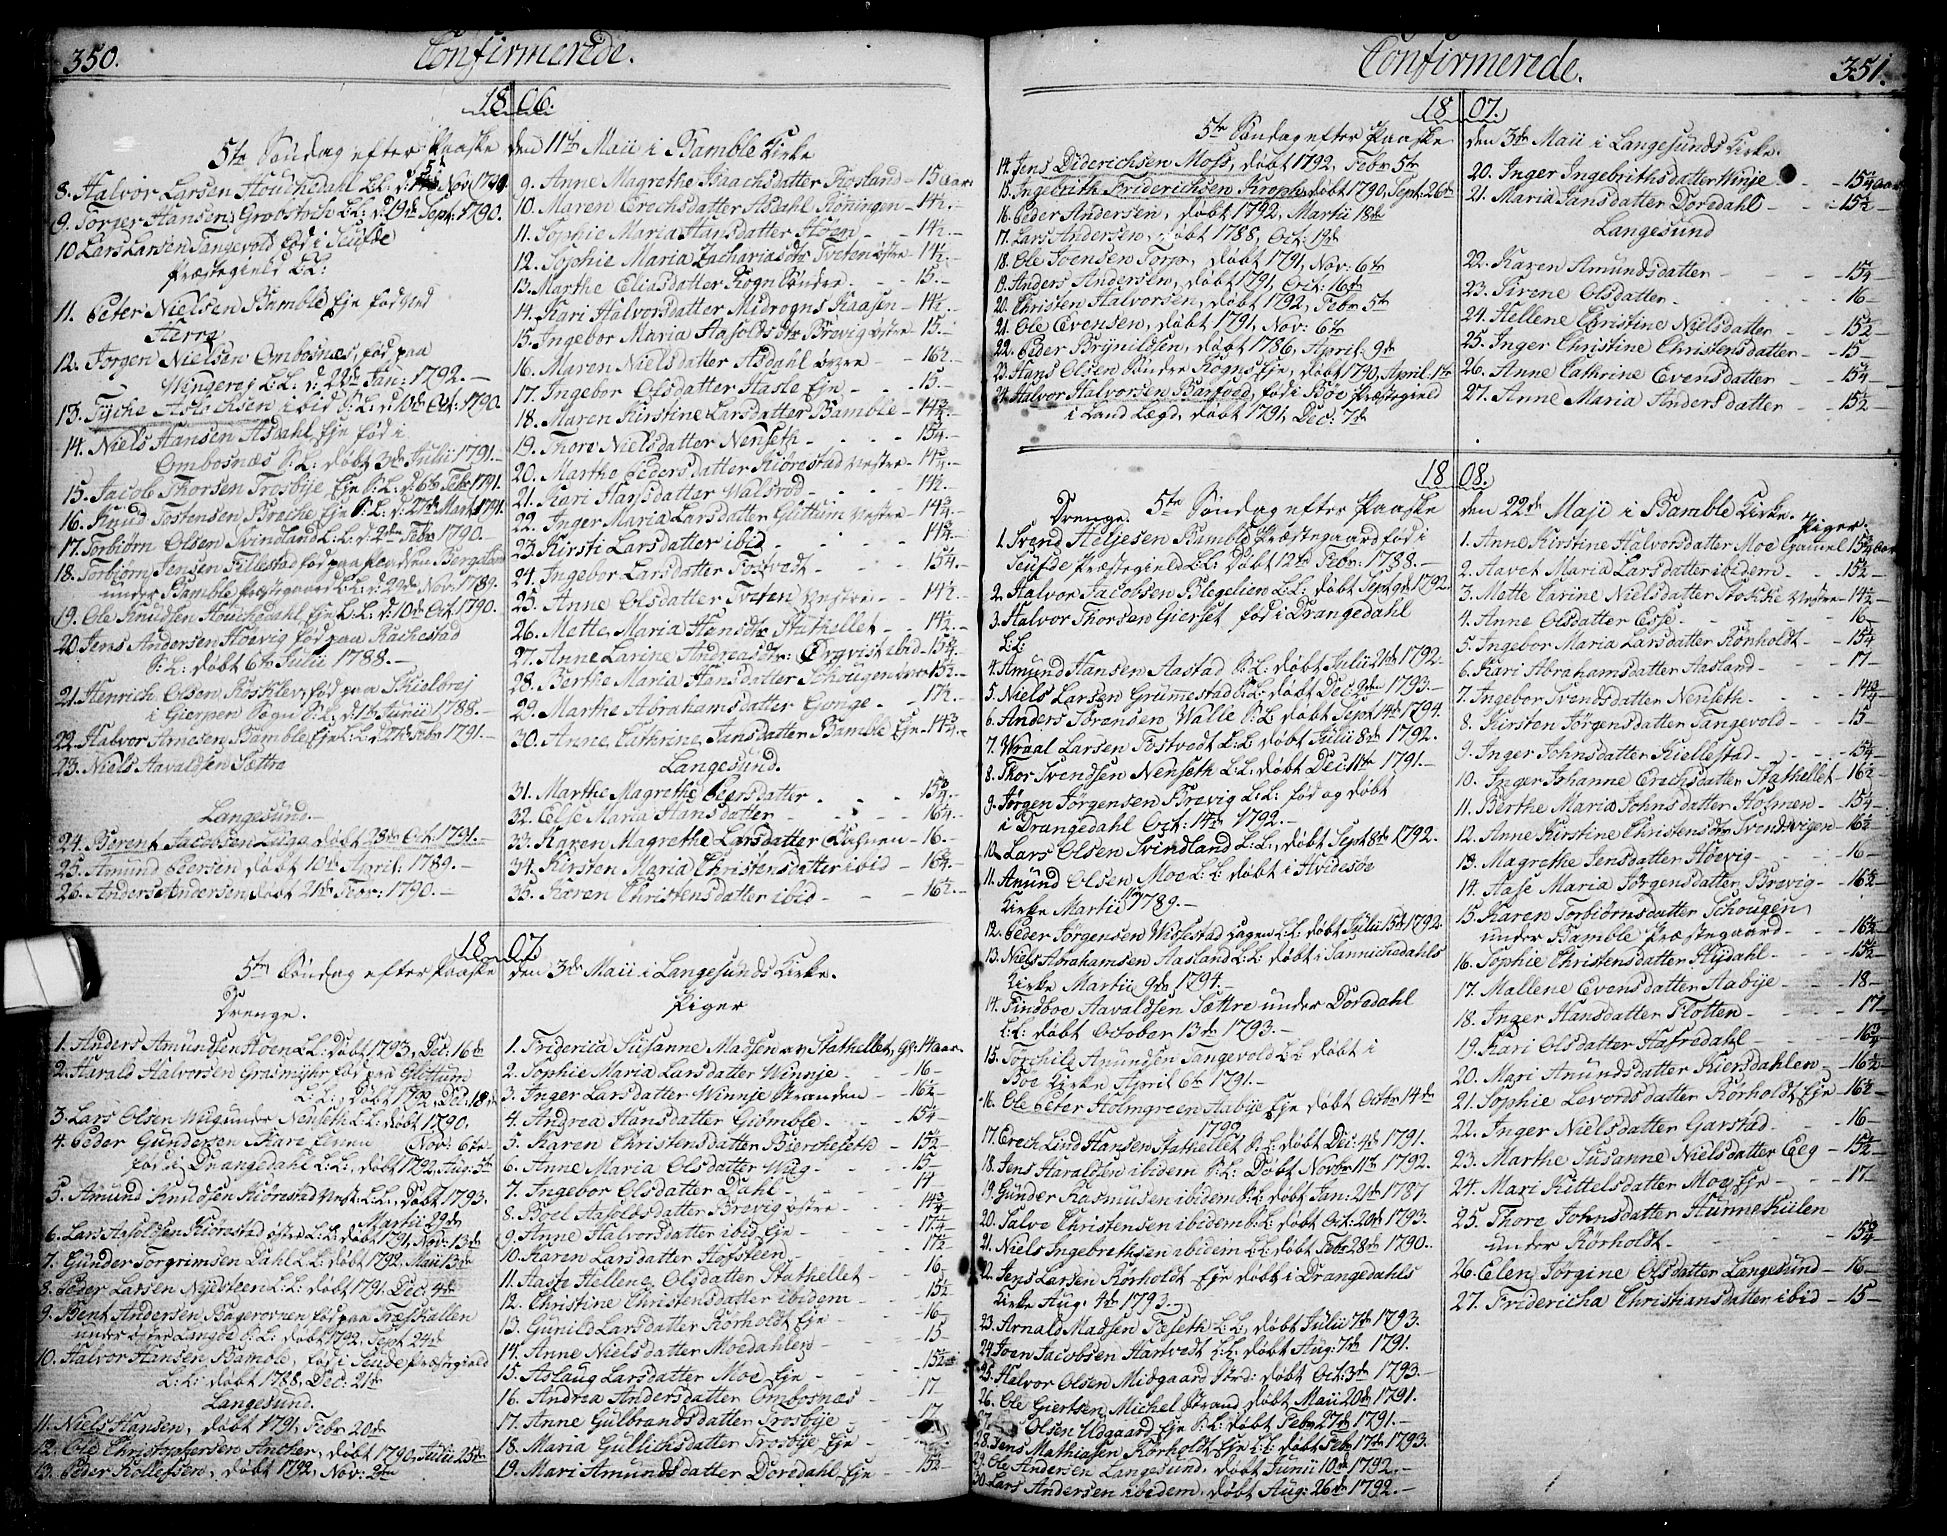 SAKO, Bamble kirkebøker, F/Fa/L0002: Ministerialbok nr. I 2, 1775-1814, s. 350-351